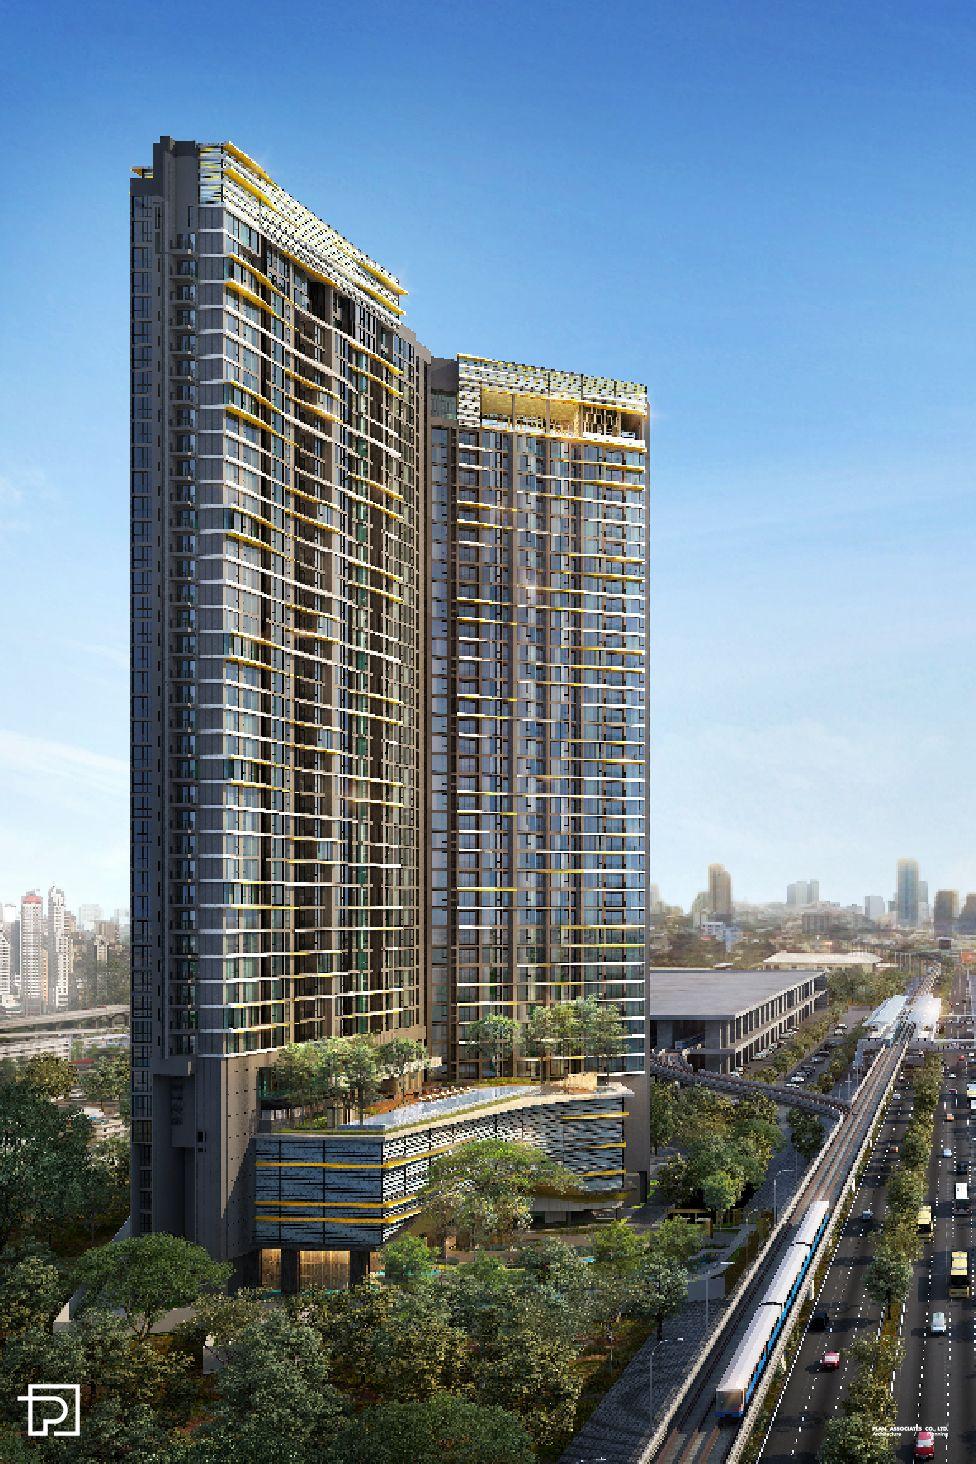 Spruce street beekman tower by frank gehry page 317 - Condominium Design Architect Plan Associates Co Ltd